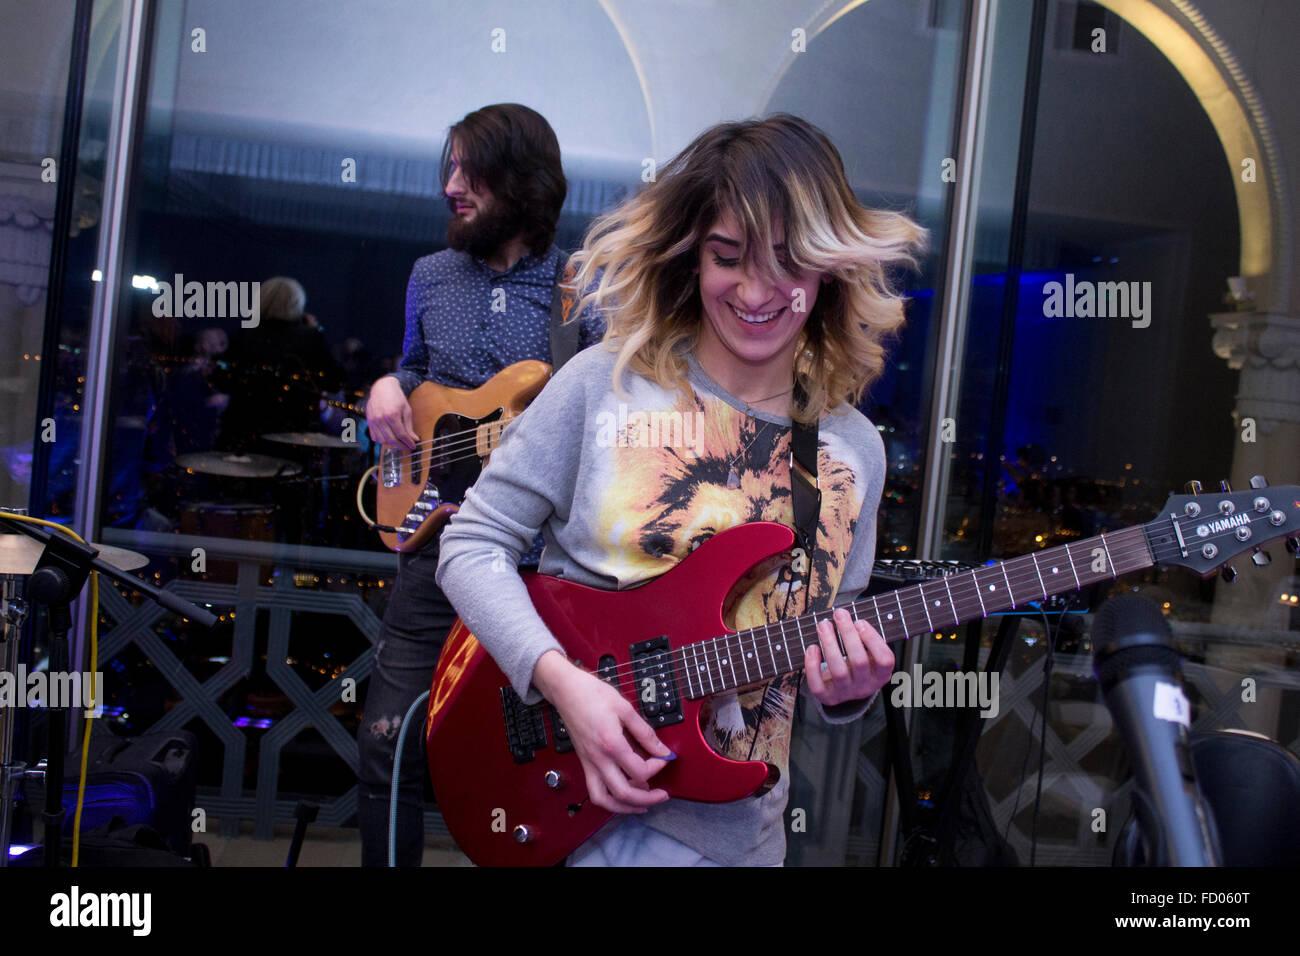 Music Band - Band E Roll, Dea Bezhuashvili at Restaurant Funicular, Tbilisi, Georgia - 12.22.2015 - Stock Image